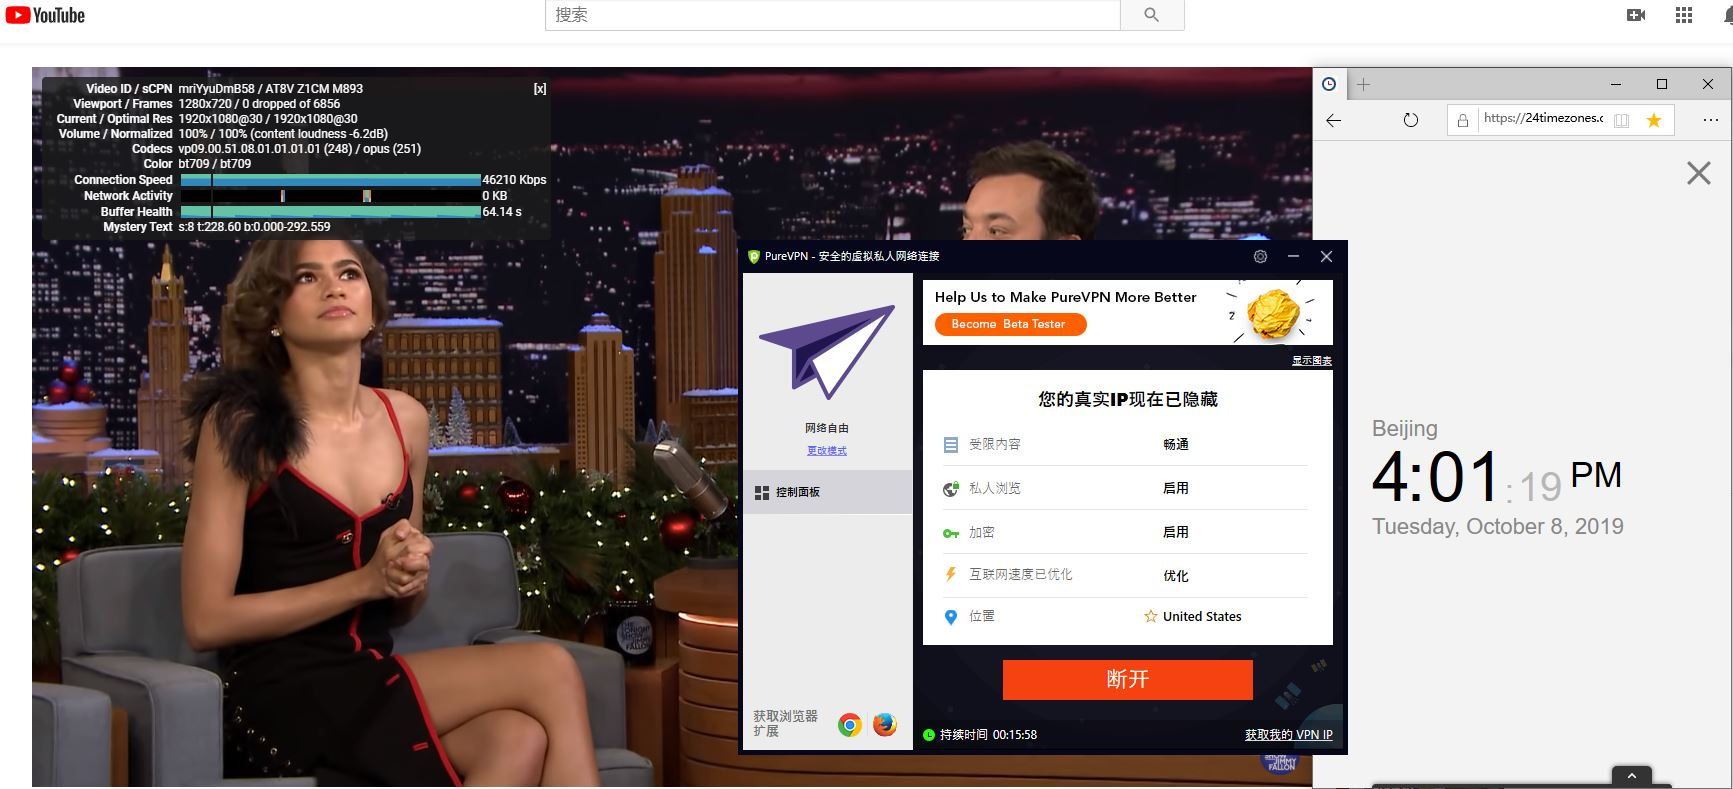 Windows PureVPN United States 中国VPN翻墙 科学上网 YouTube测速-20191008